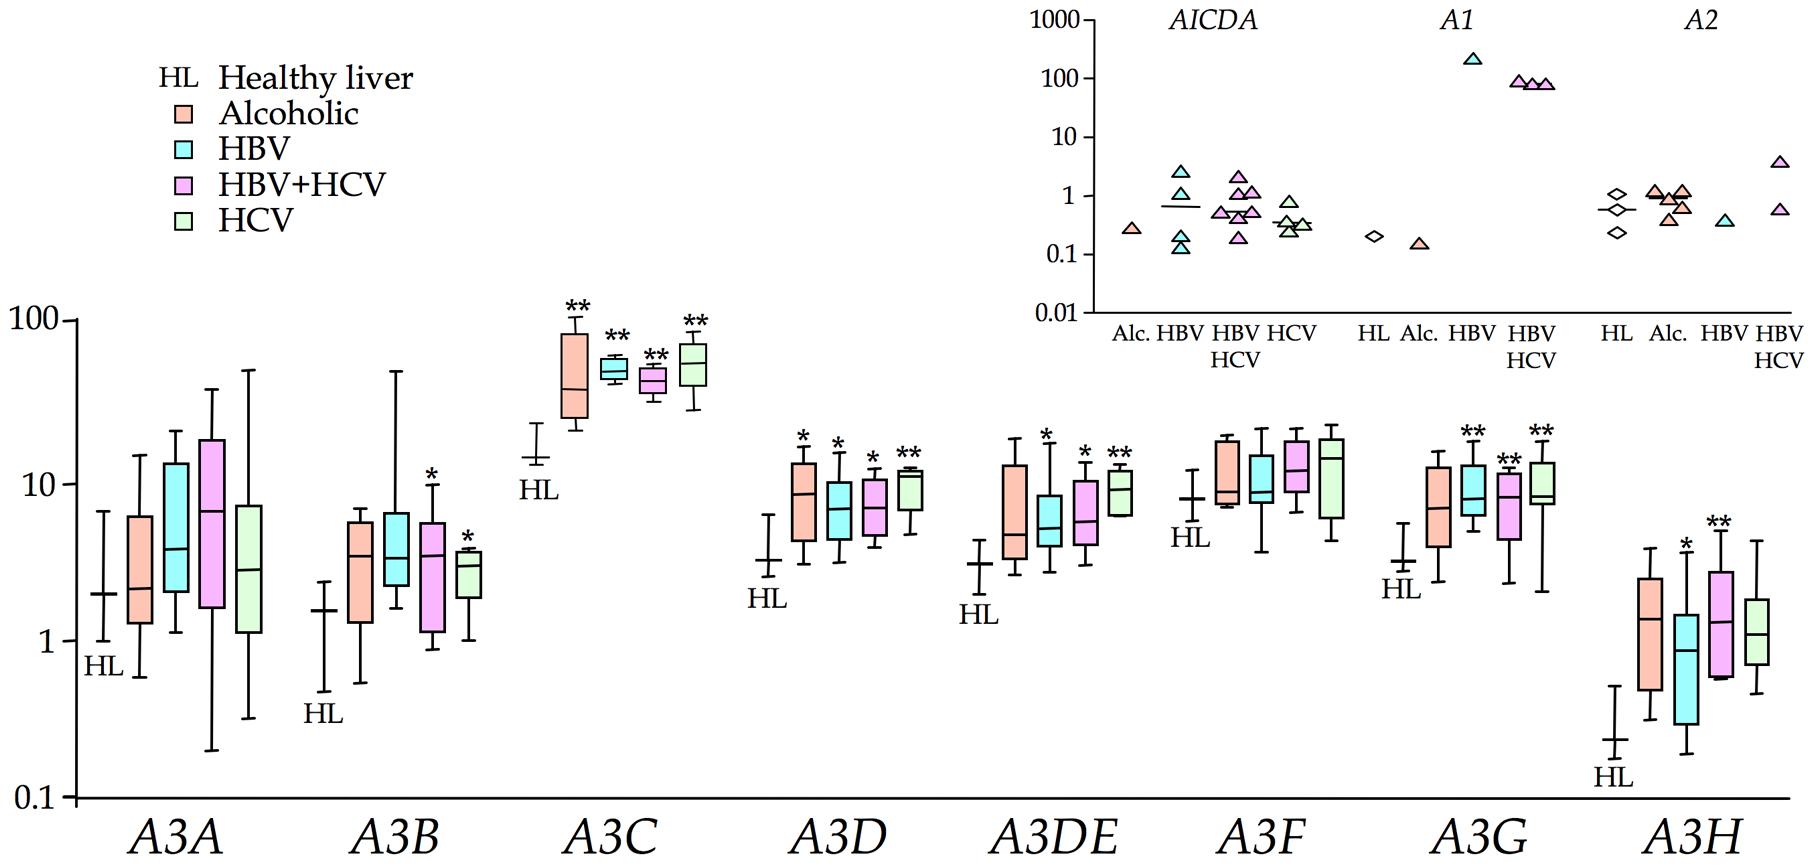 Transcription profiling of all 11 human cytidine deaminases in cirrhosis.